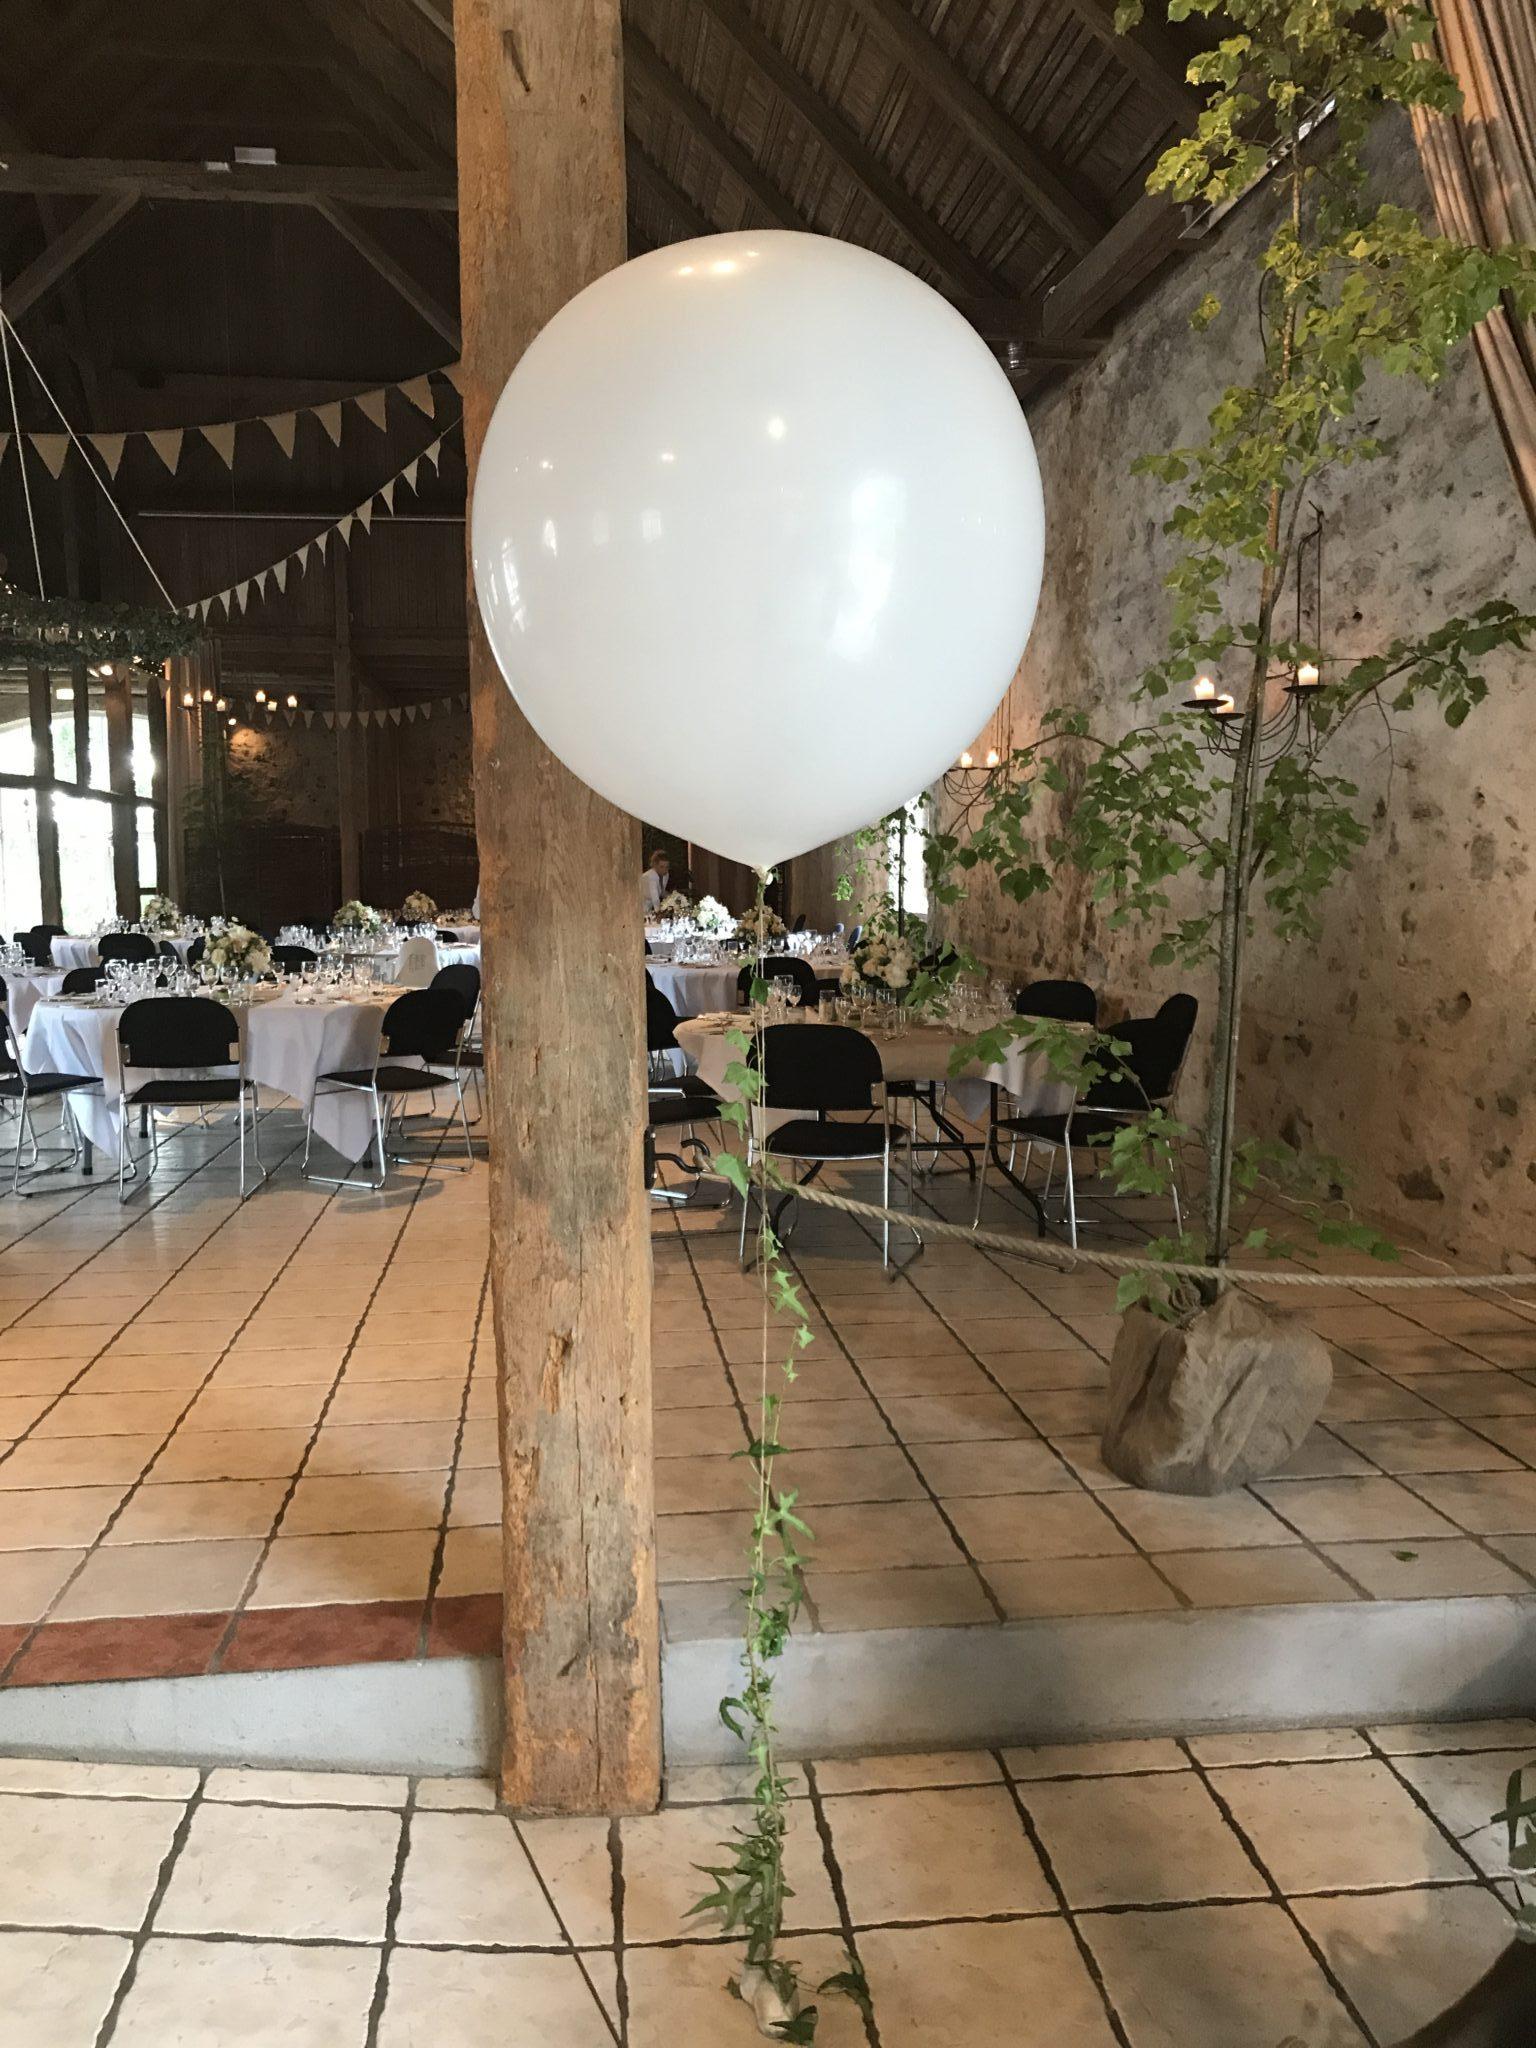 Kæmpeballon til bryllup